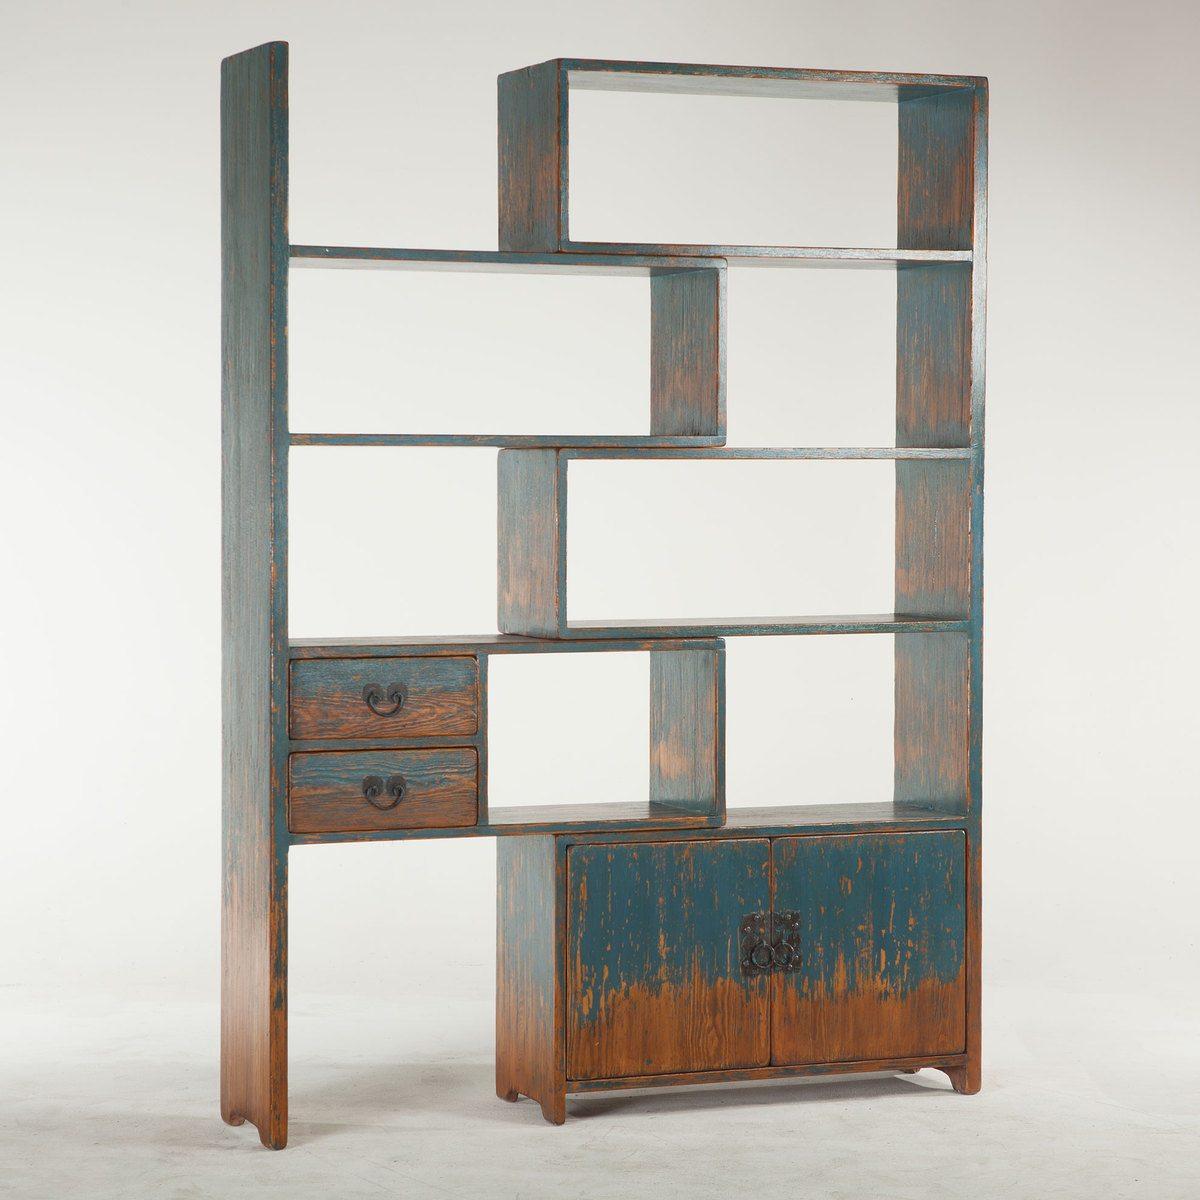 library-bookshelf-4